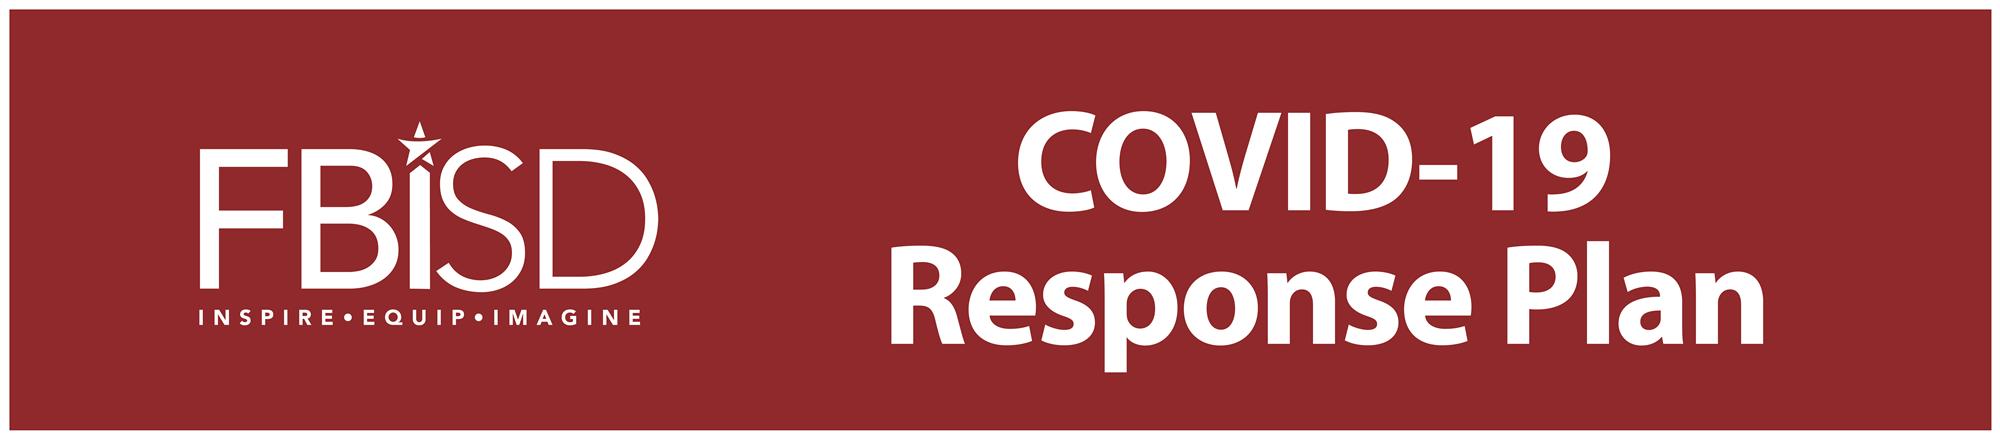 COVID-19 Response Plan